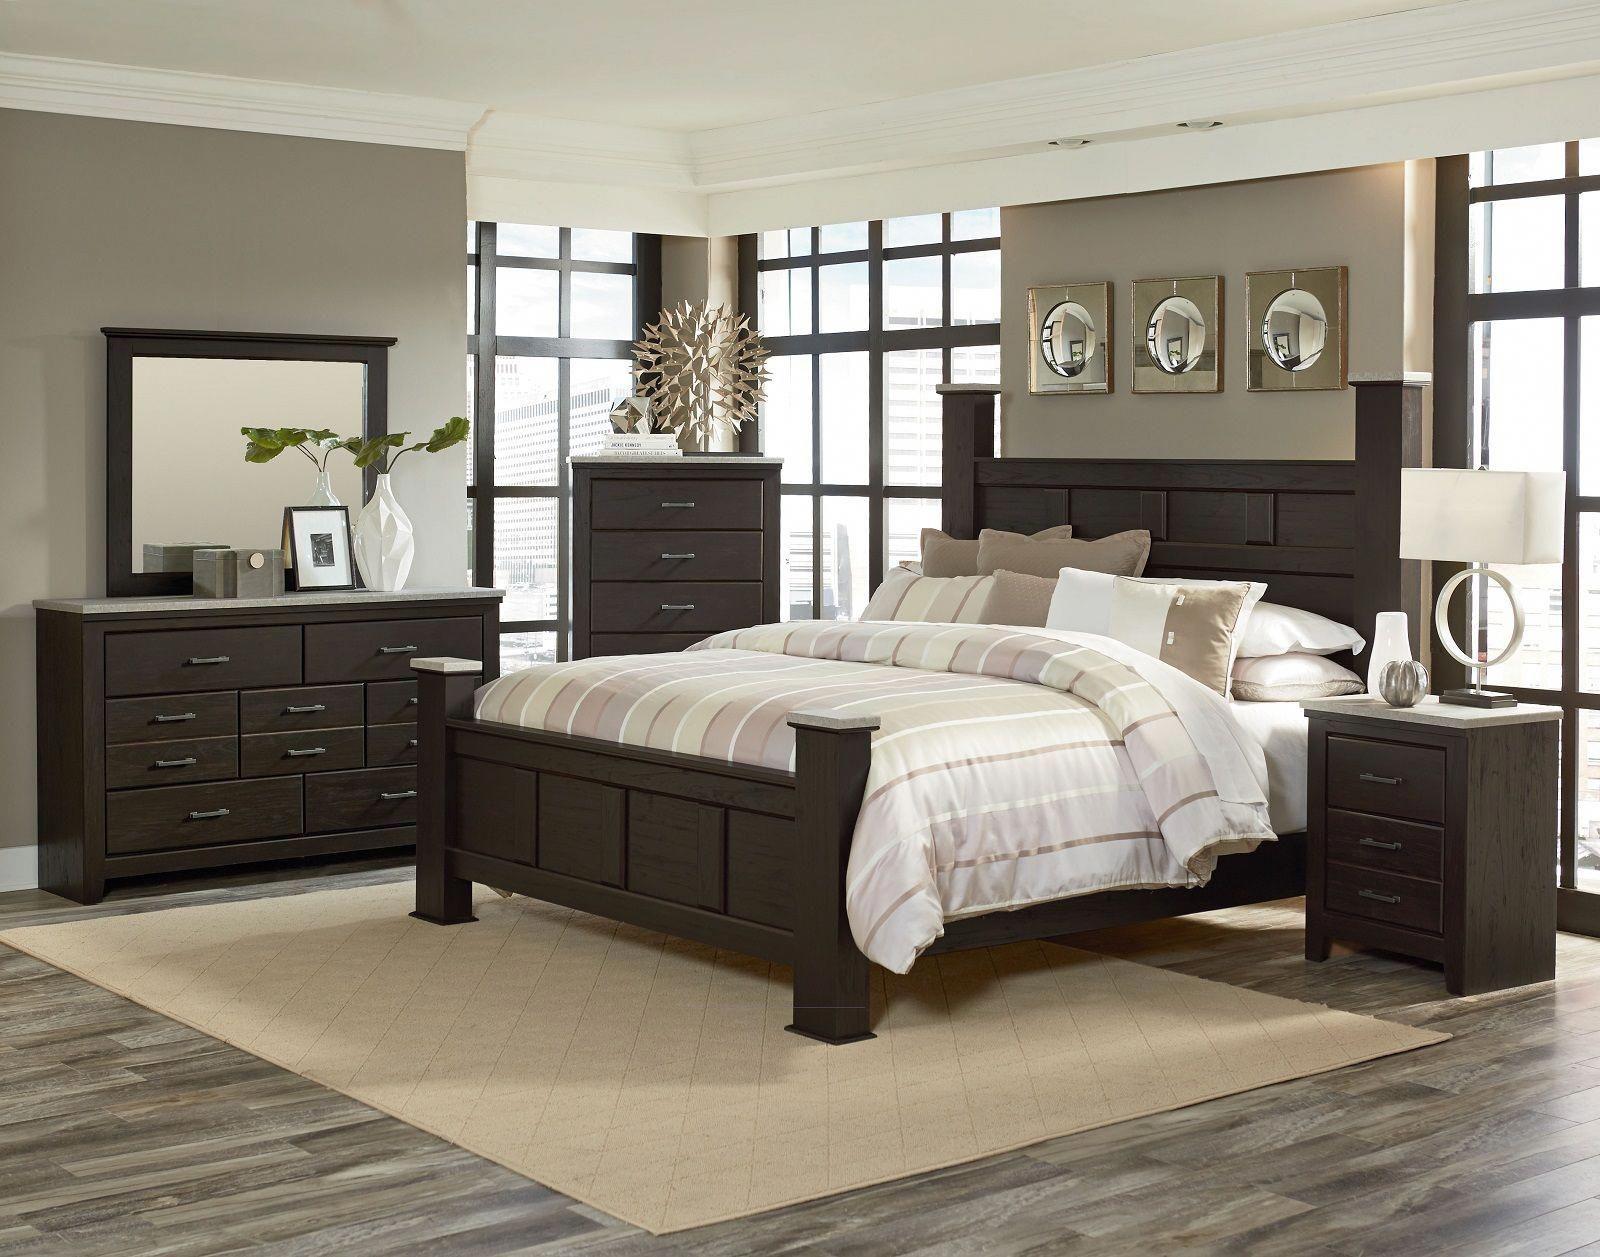 Standard furniture stonehill piece poster bedroom set in dark